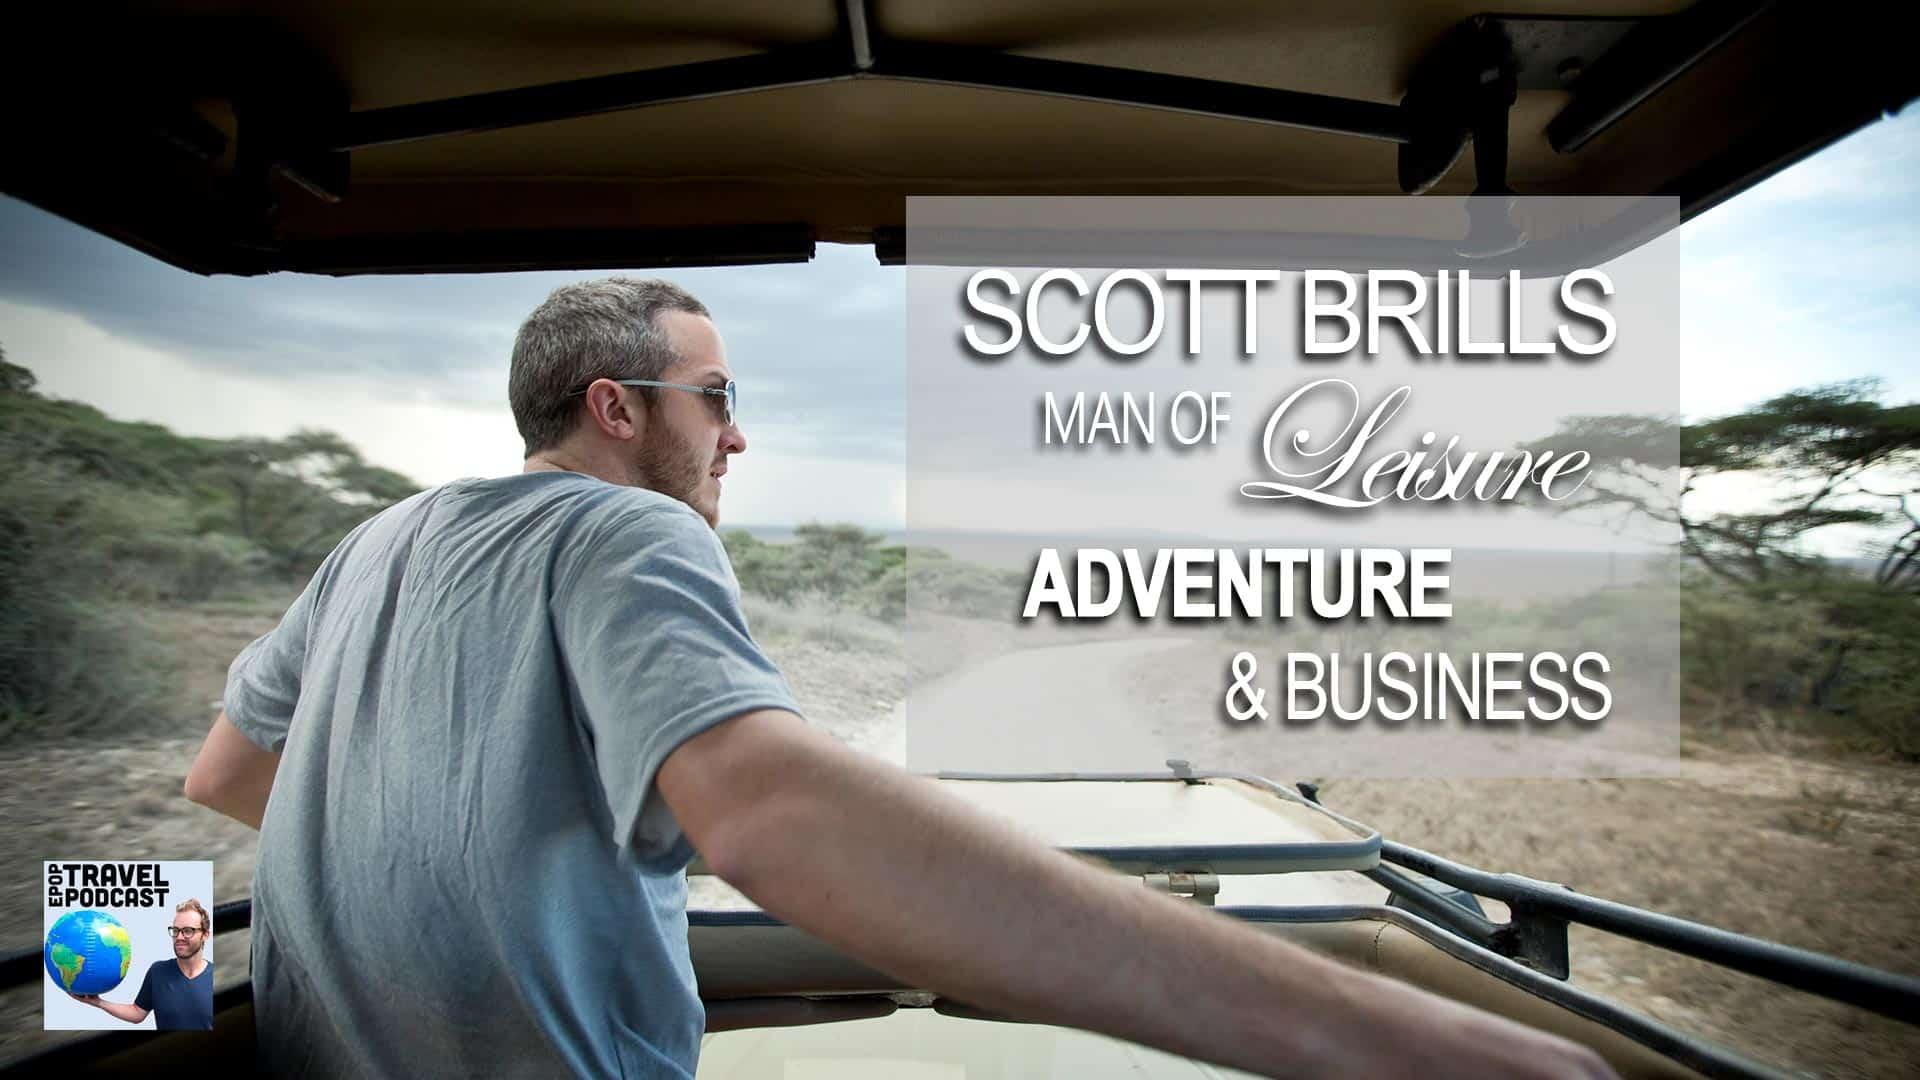 Extra Pack of Peanuts EPoP Travel Podcast #301 Scott Brills